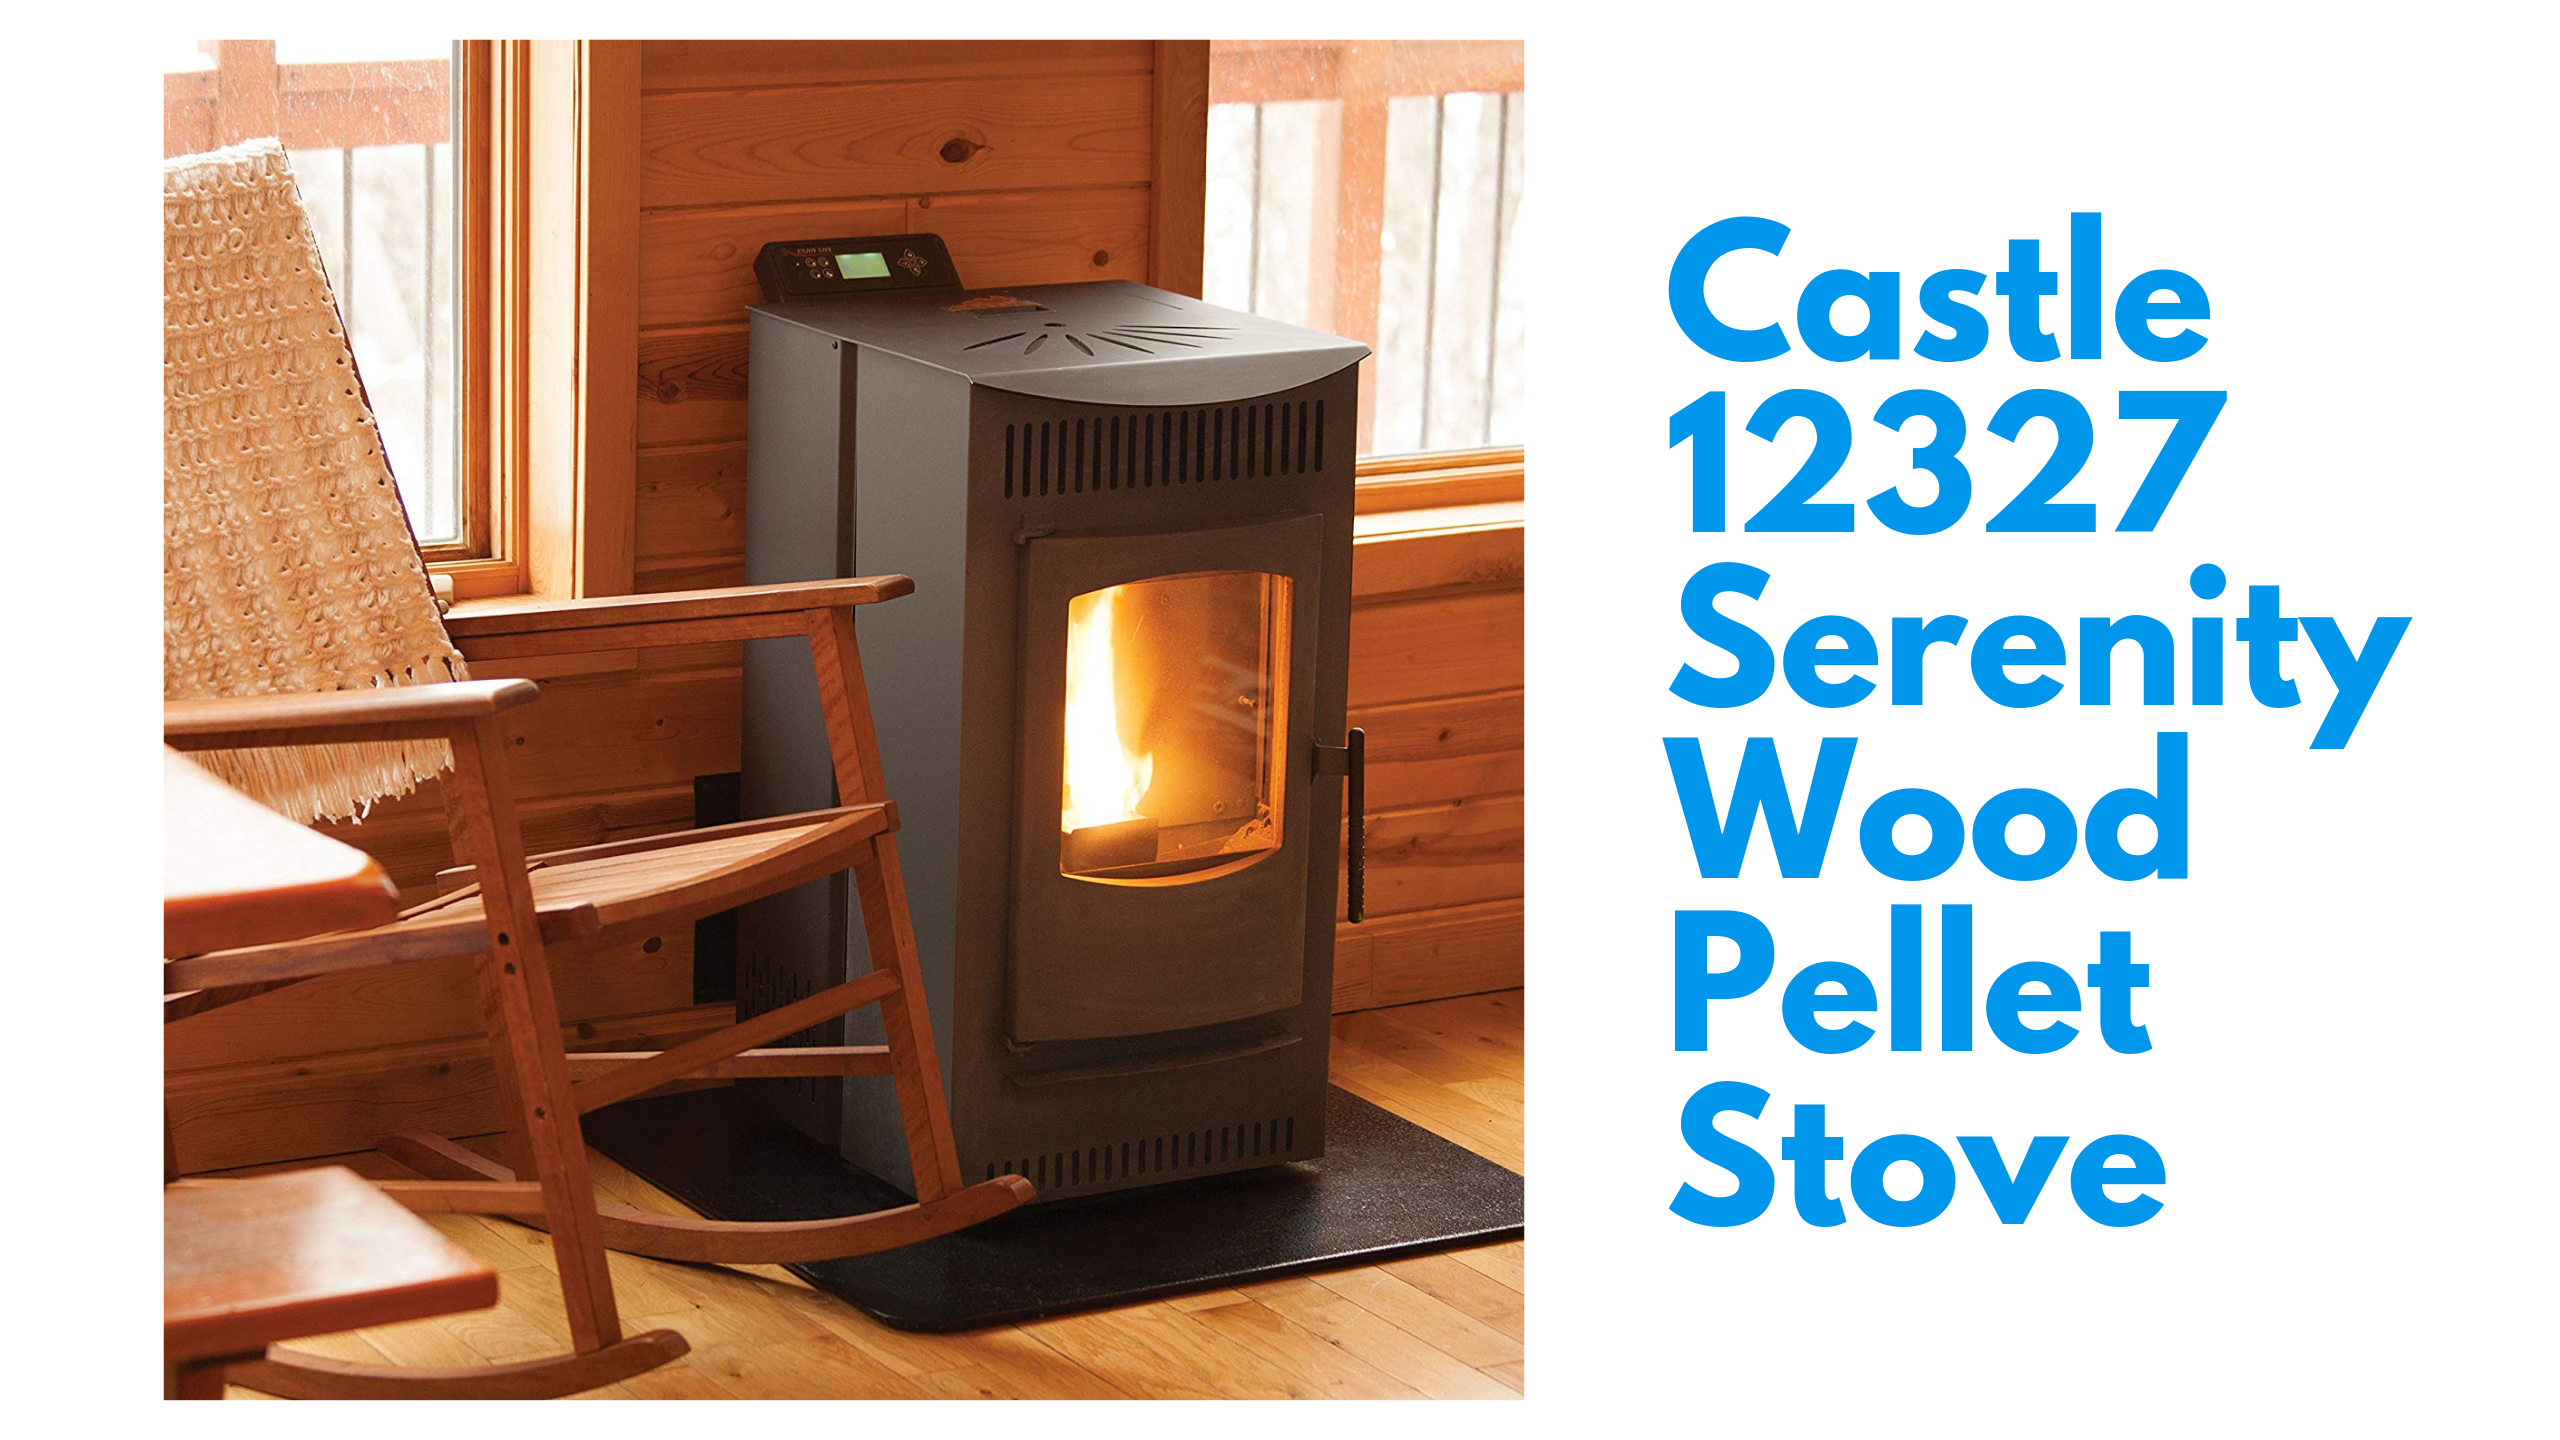 Castle 12327 Serenity Wood Pellet Stove